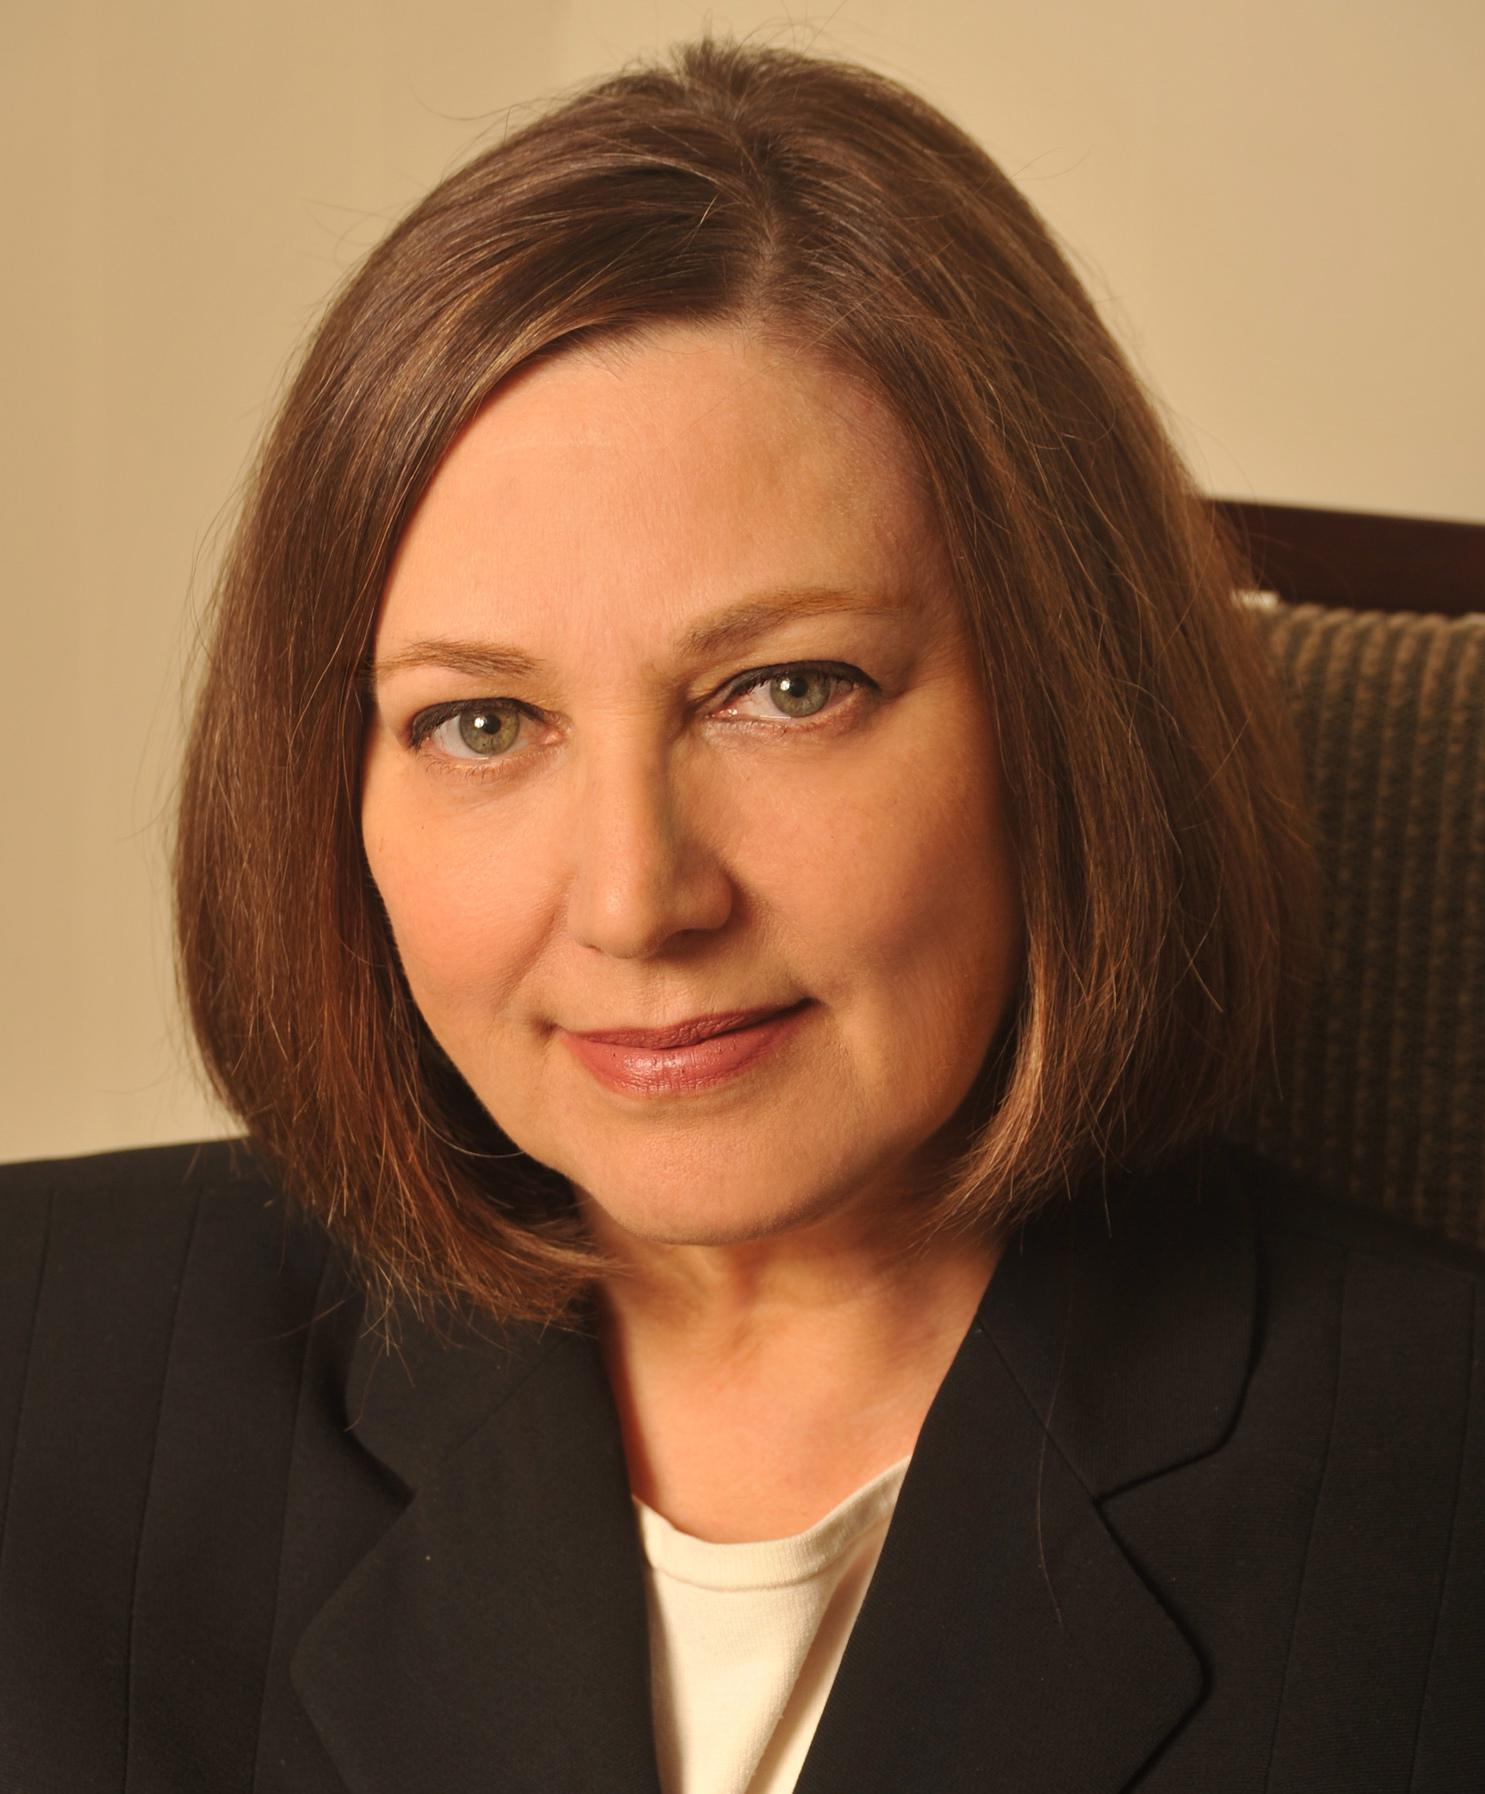 Winnipeg Hypnotist Janis Rosen weight loss quit smoking